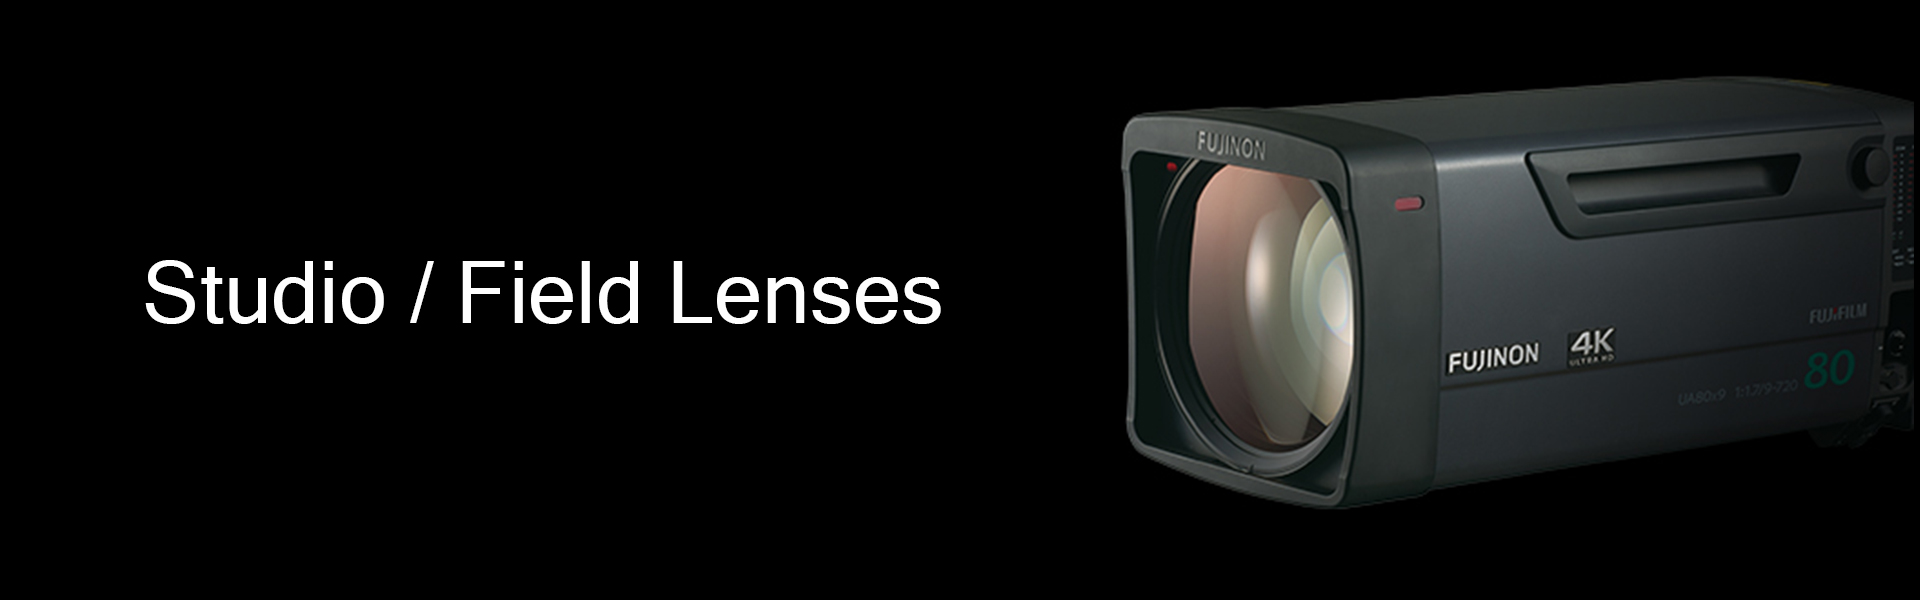 [photo] Studio / Field 4K lens in front of black background